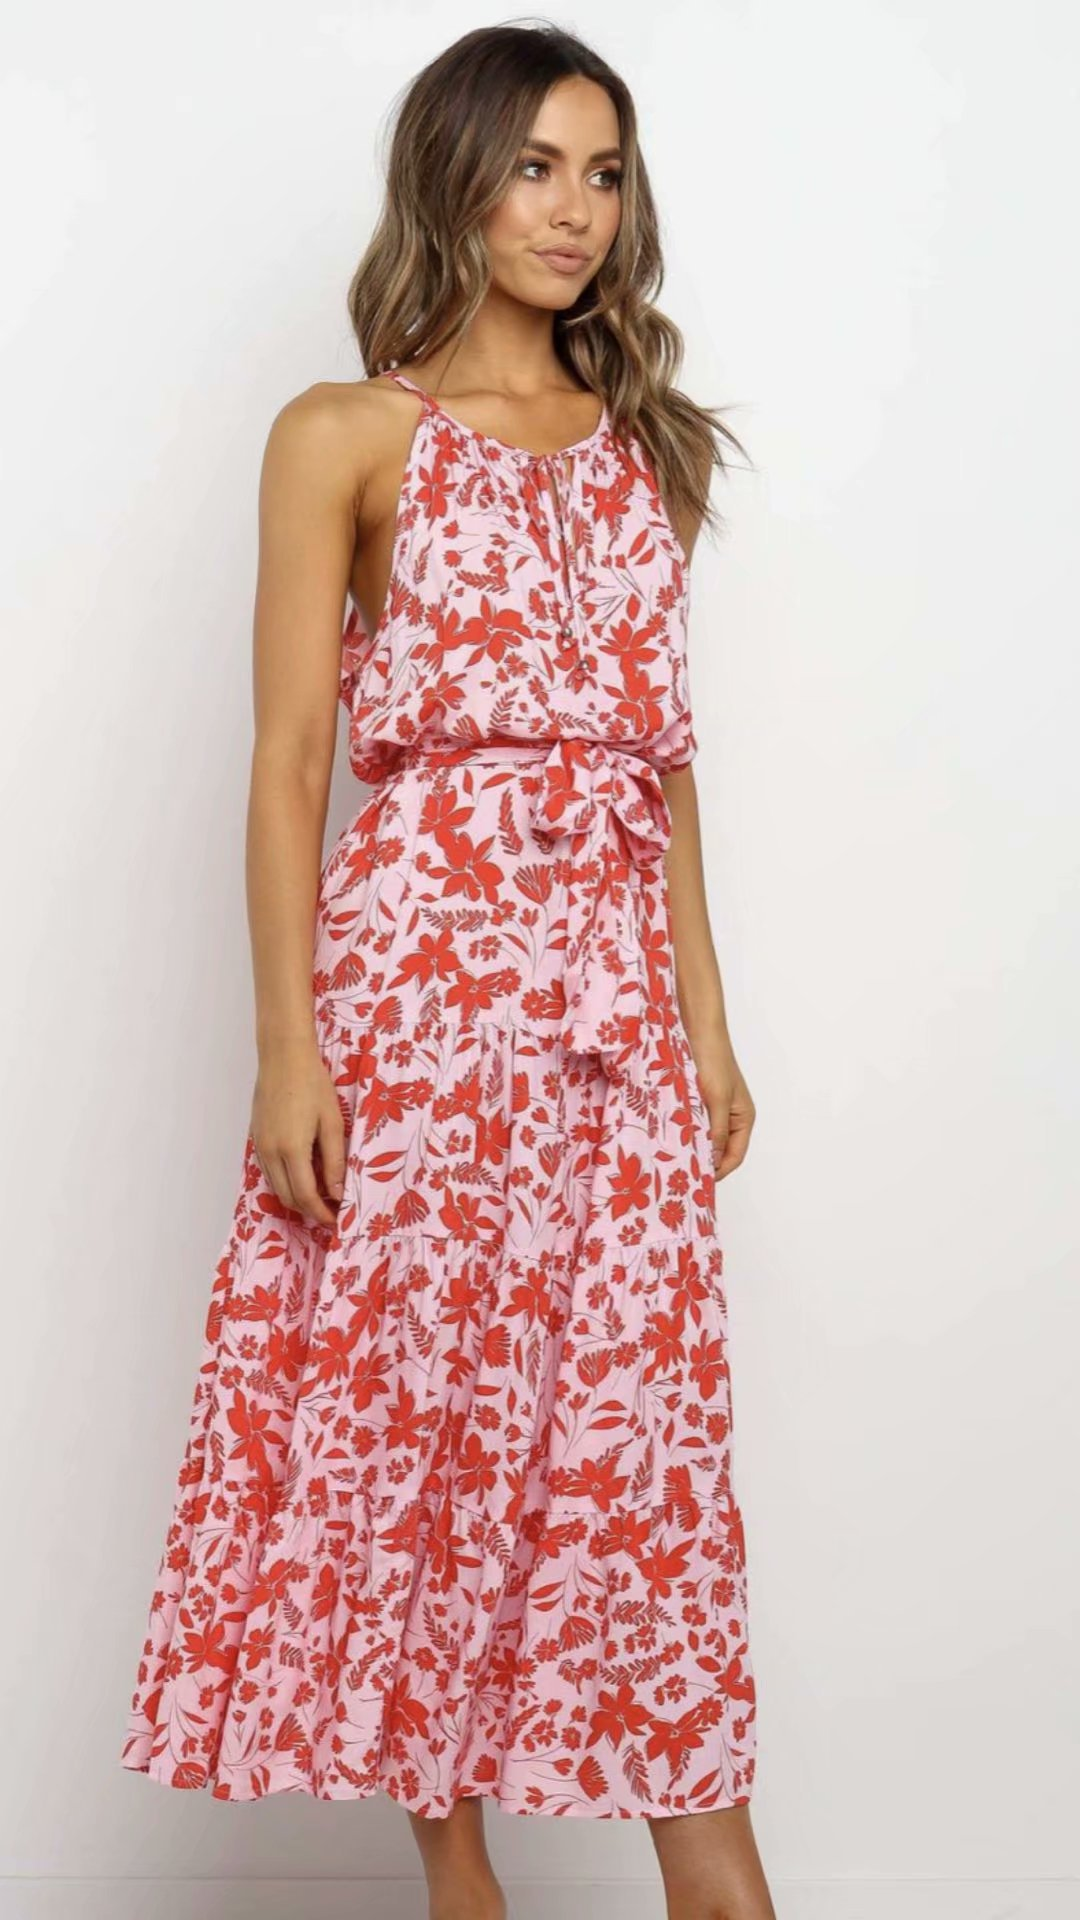 2020 New Spring Summer European Floral Printed Zaraing Women Dress Vadiming Sheining Female Halter Printed Dress S496